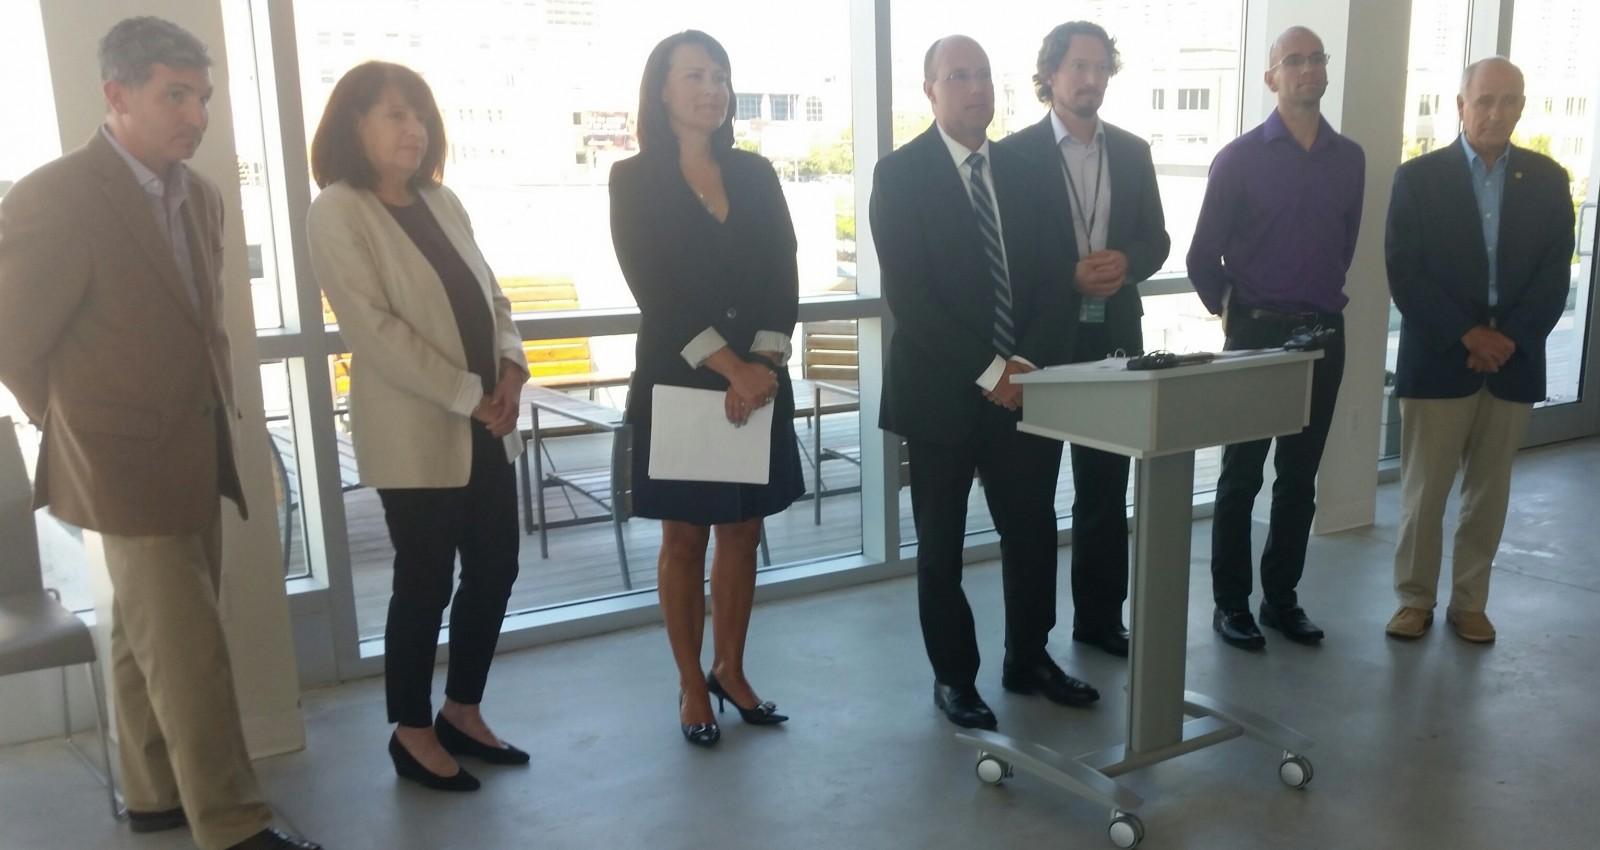 Mayor unveils new poverty advisory panel